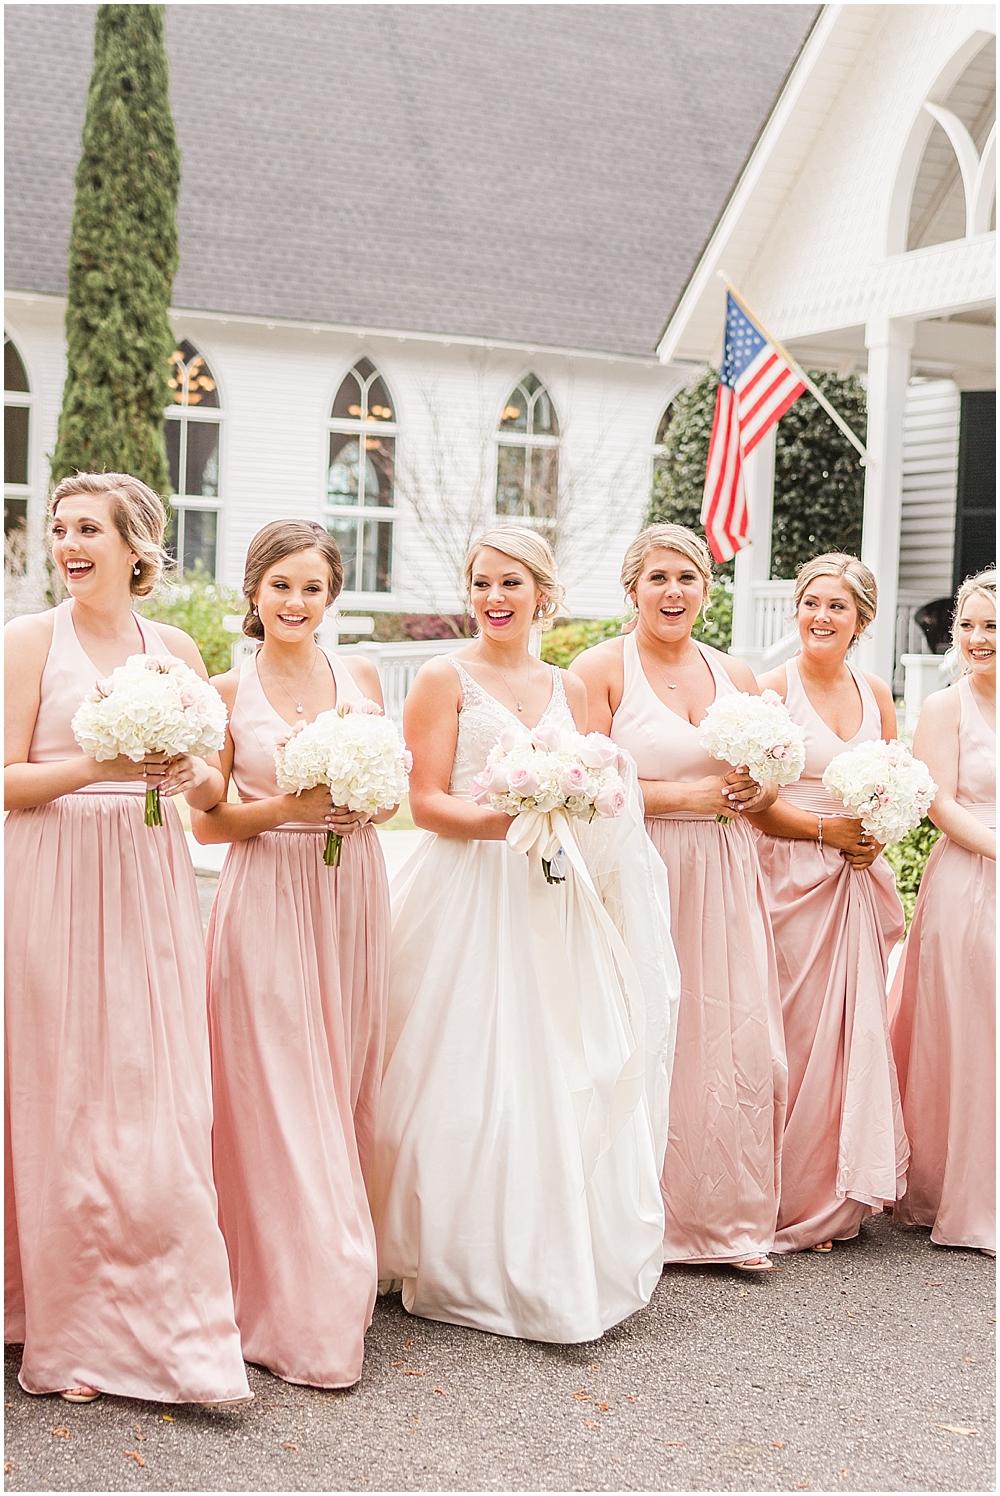 Ashton-Clark-Photography-Wedding-Portrait-Family-Photographer-Mobile-Alabama_0313.jpg